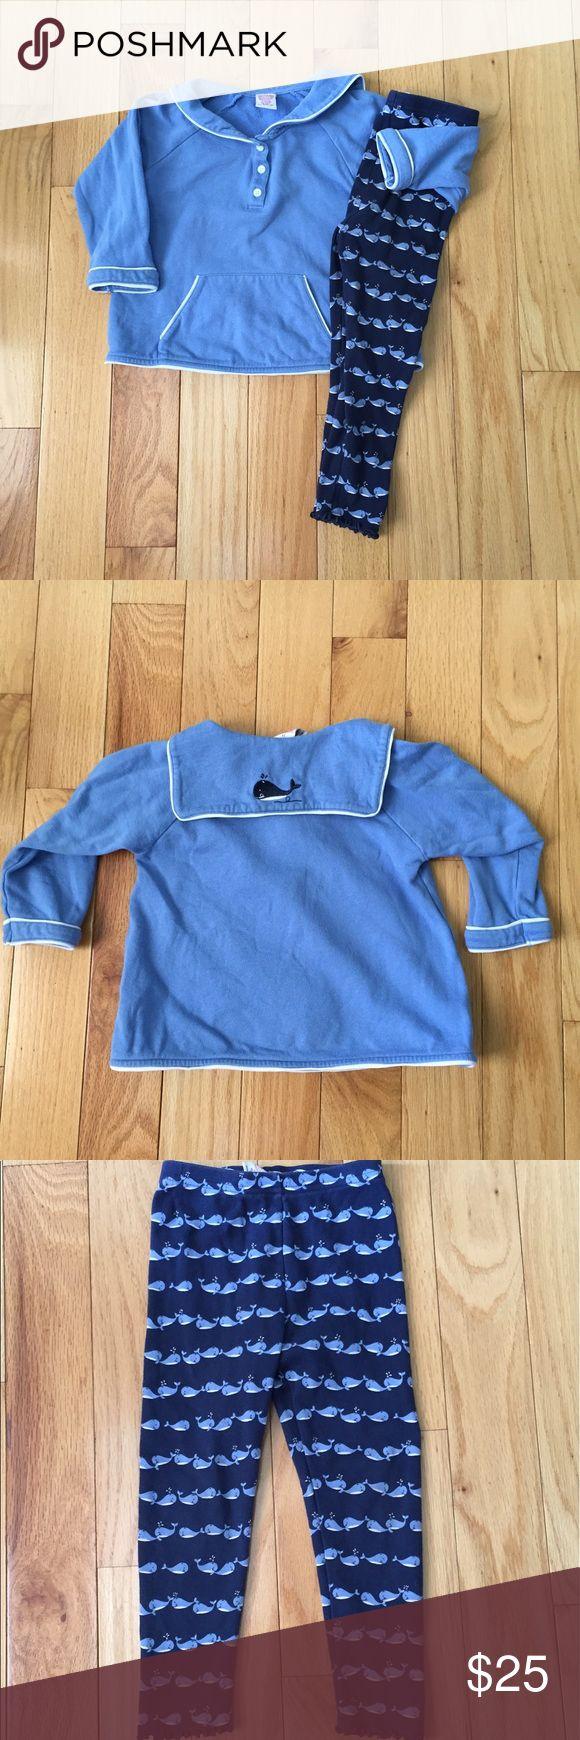 Gymboree Whale Watching set Medium weight sweatshirt & whale 🐳 leggings.  Vguc light wash wear. Gymboree Matching Sets